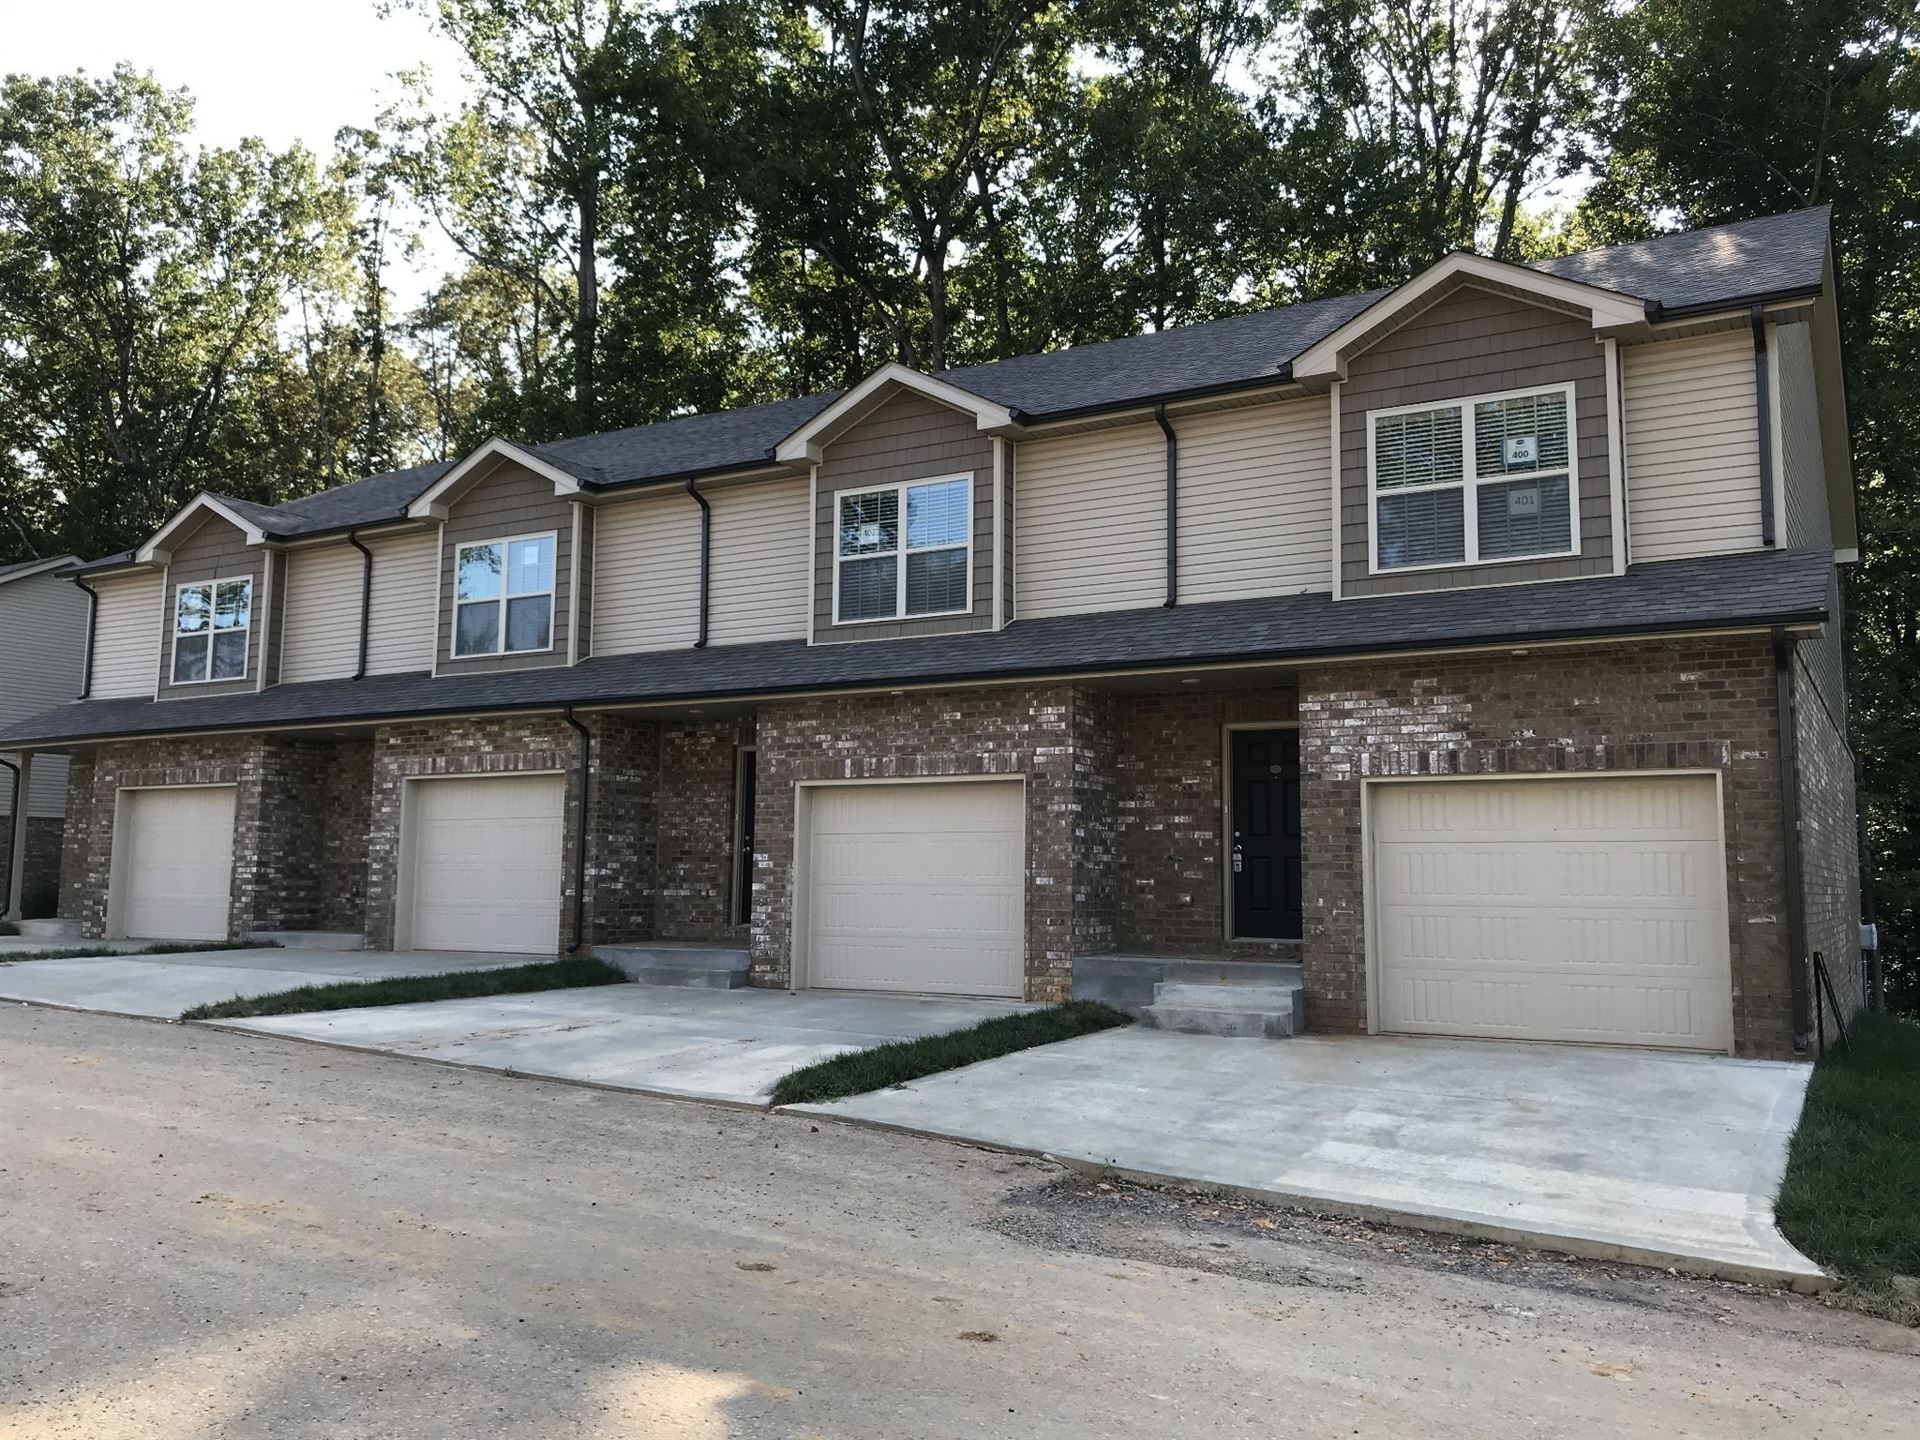 135 Country Lane Unit 403, Clarksville, TN 37043 - MLS#: 2177036